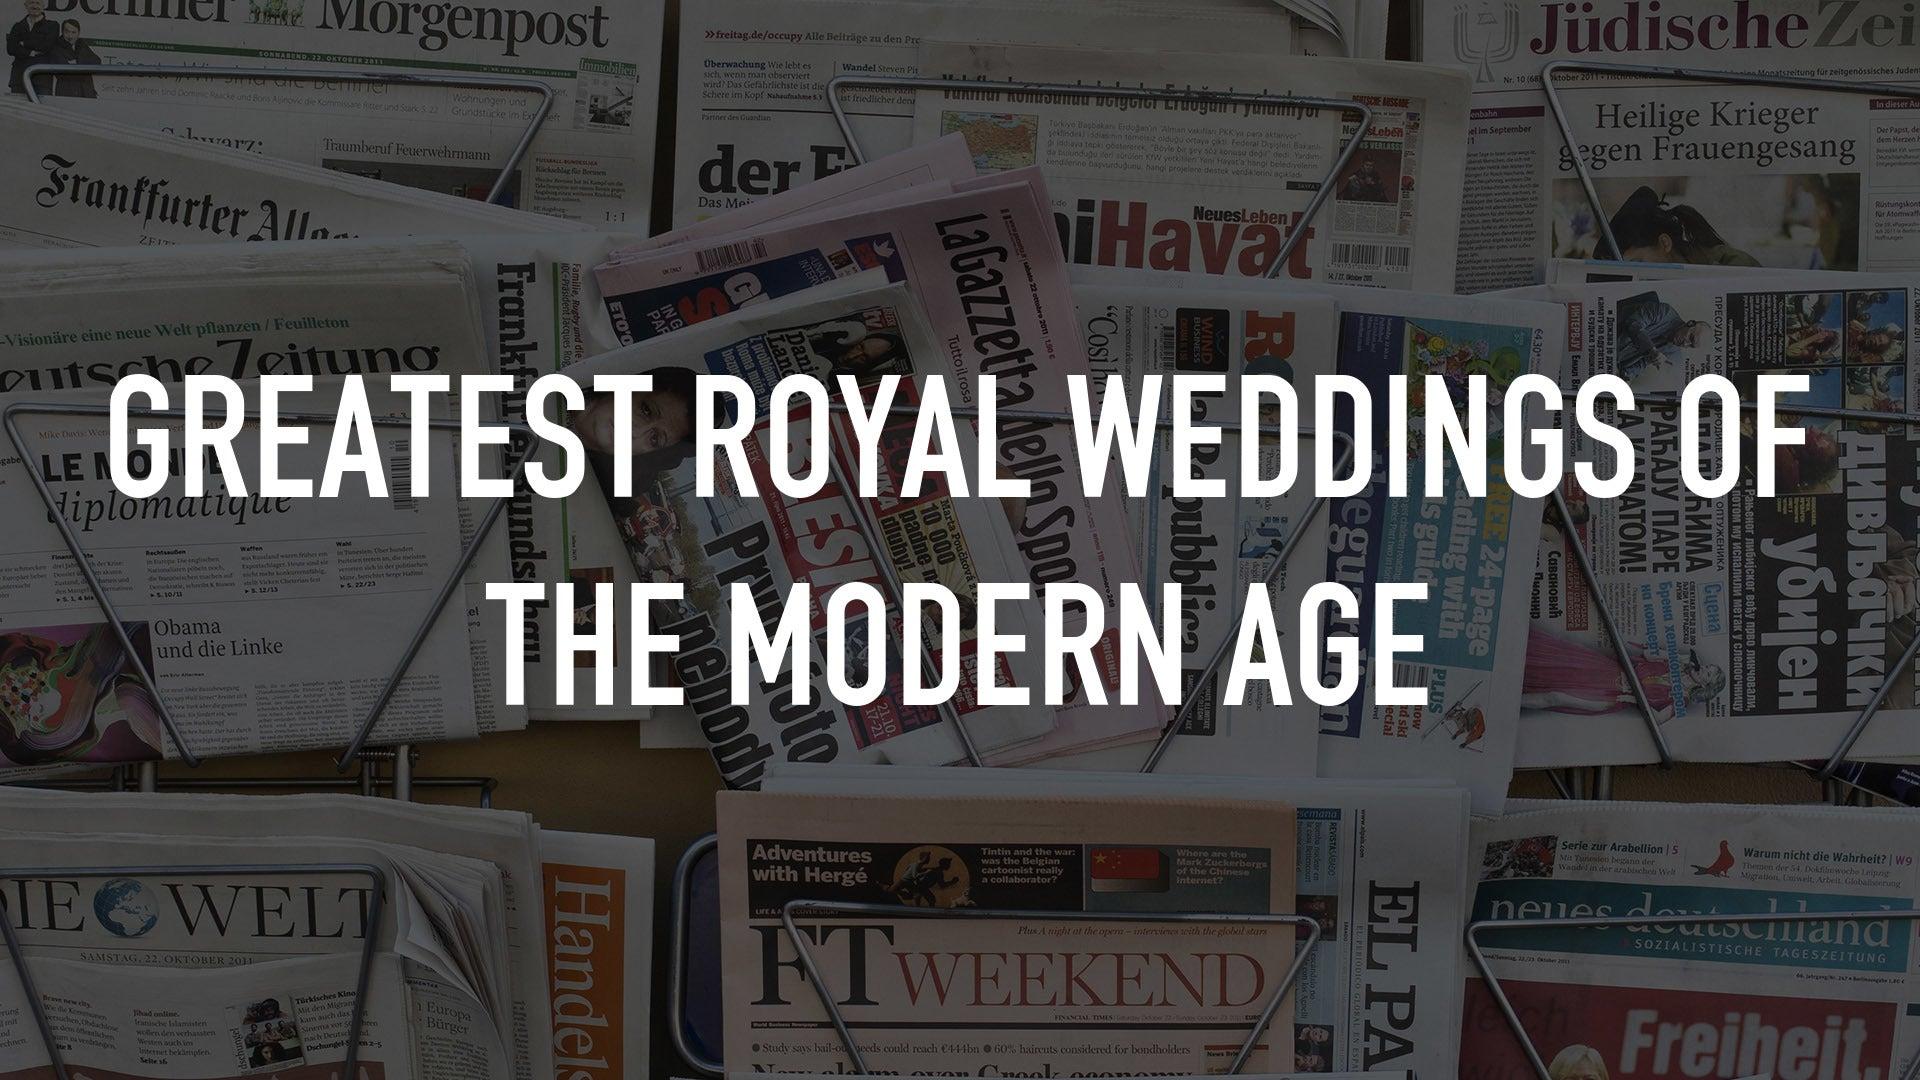 Greatest Royal Weddings of the Modern Age